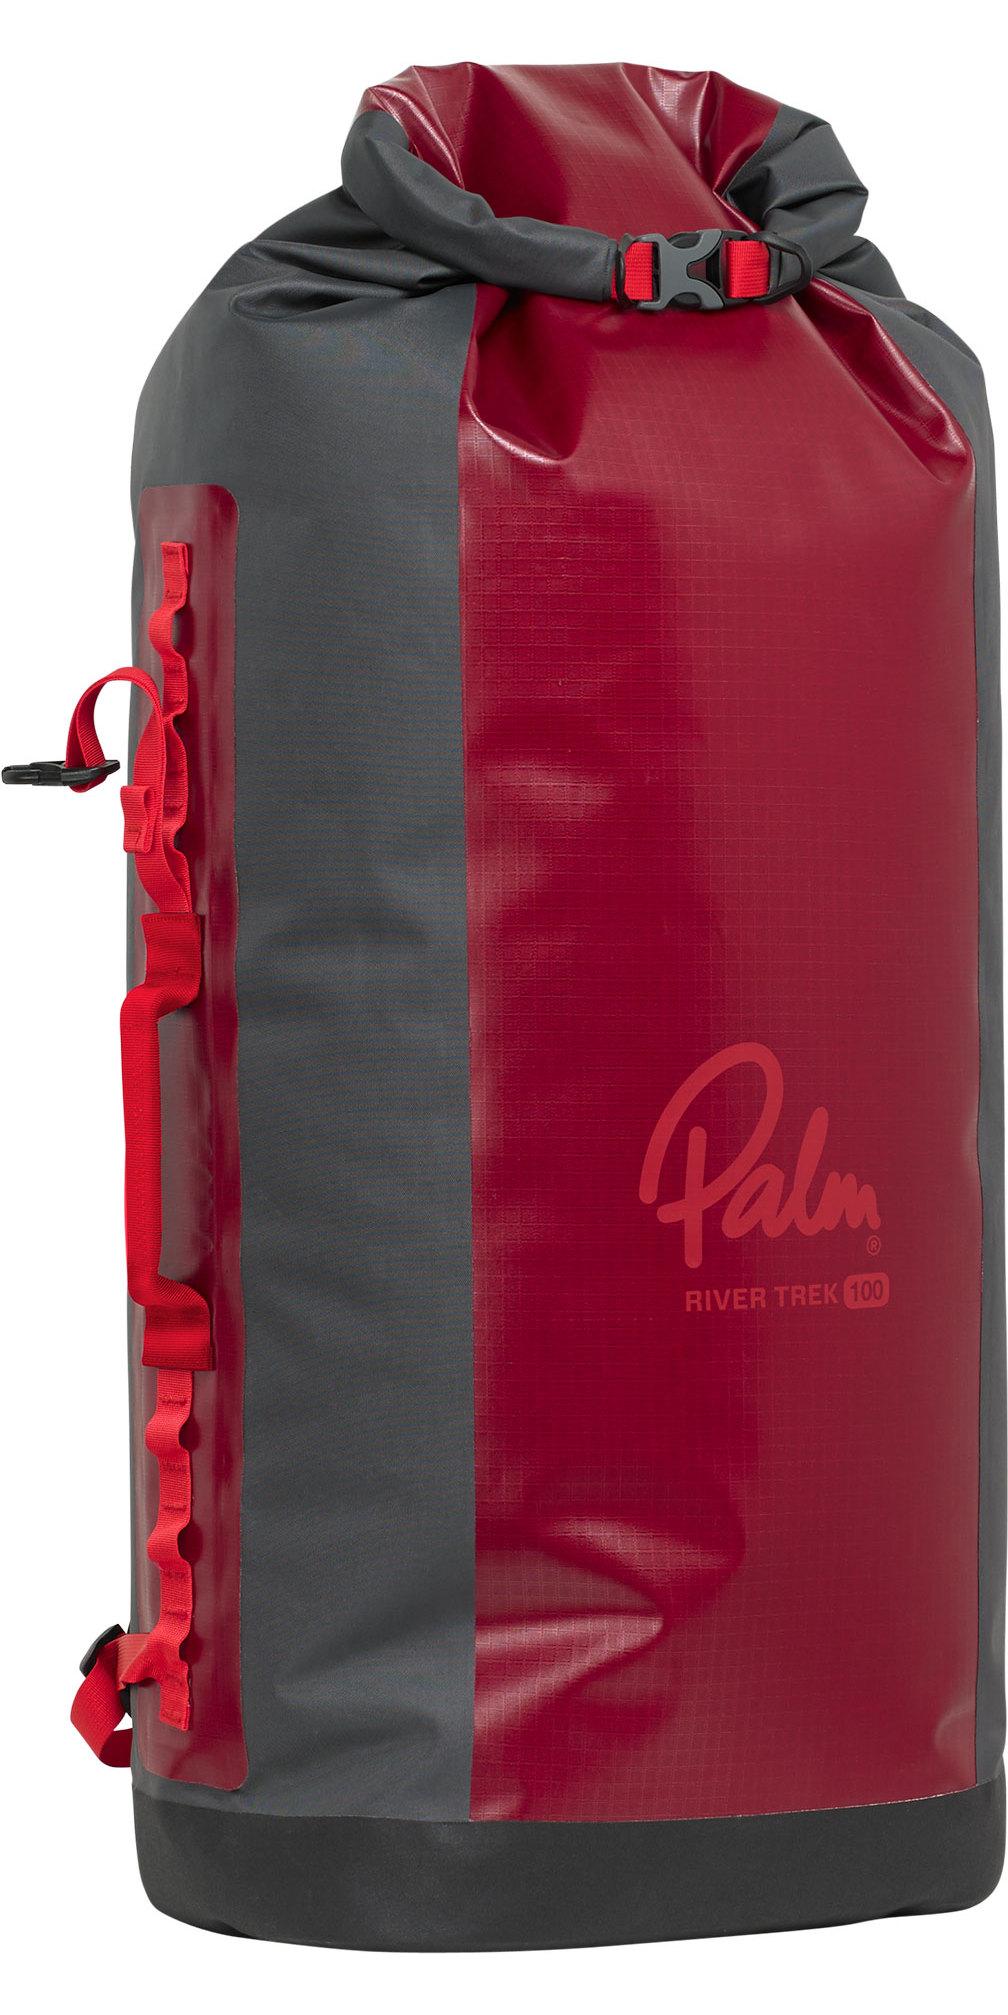 Palm-River-Trek-100L-Dry-Back-Pack-12348---Chilli-Jet-Grey.jpg